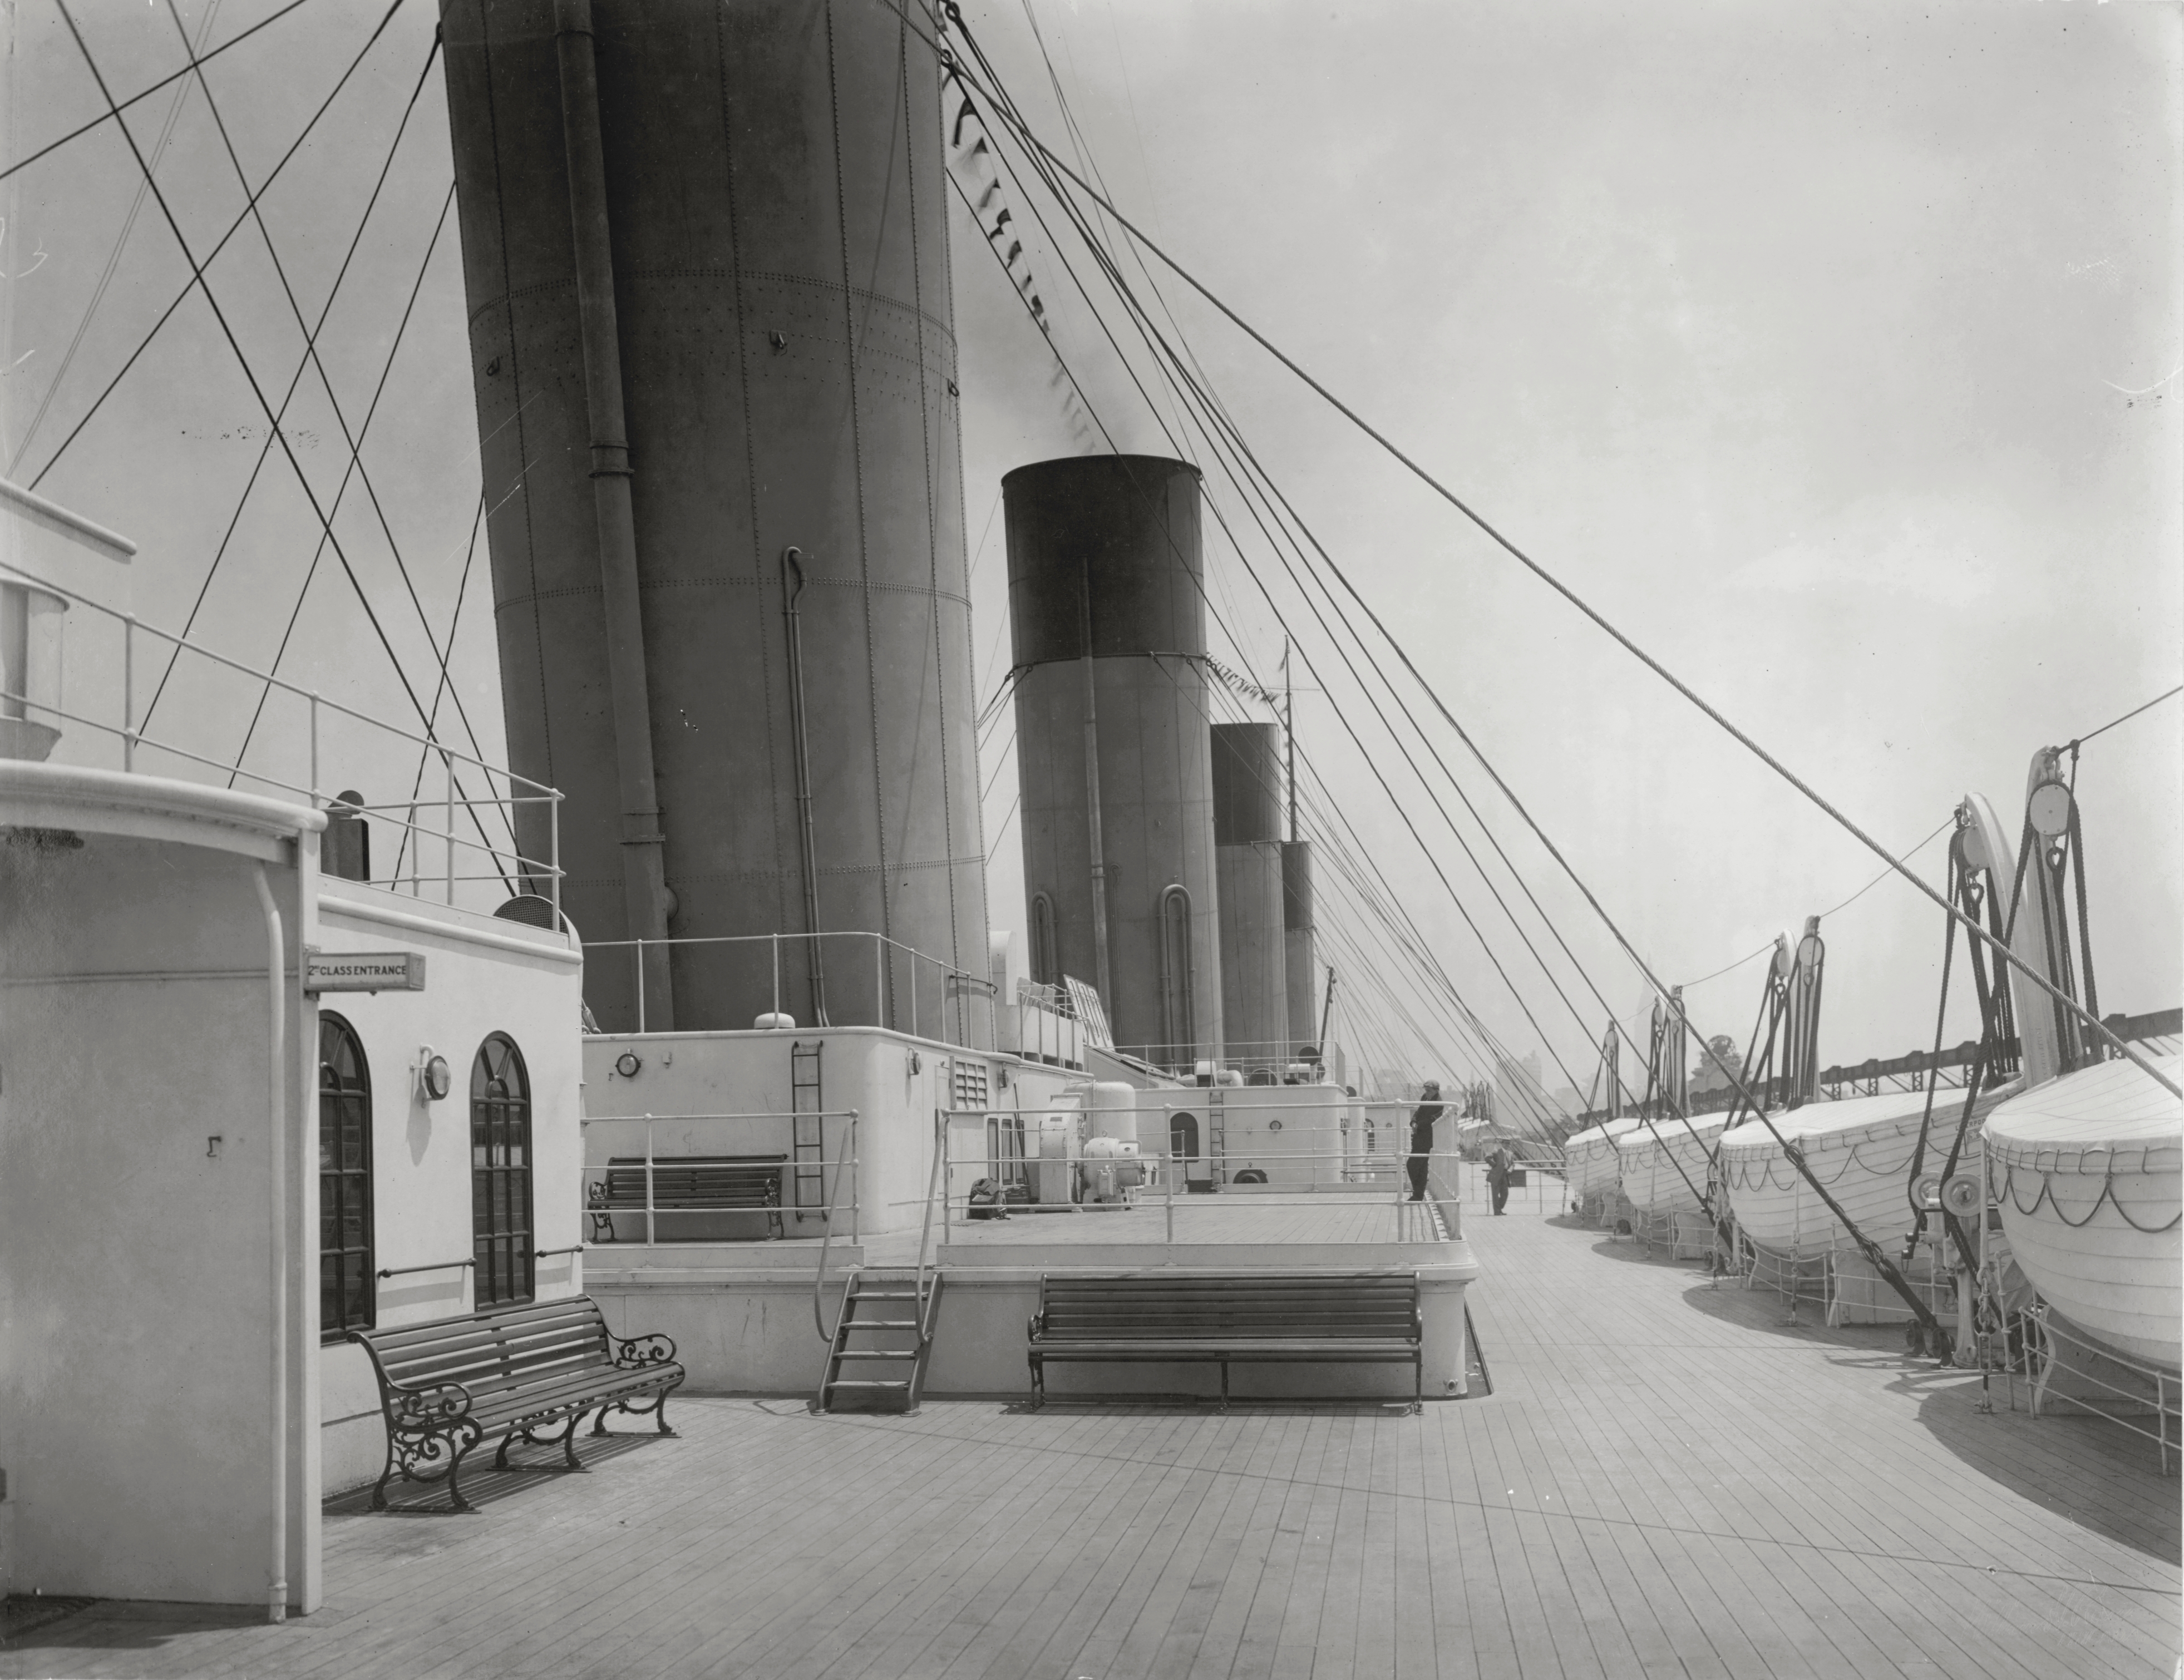 deck (ship)